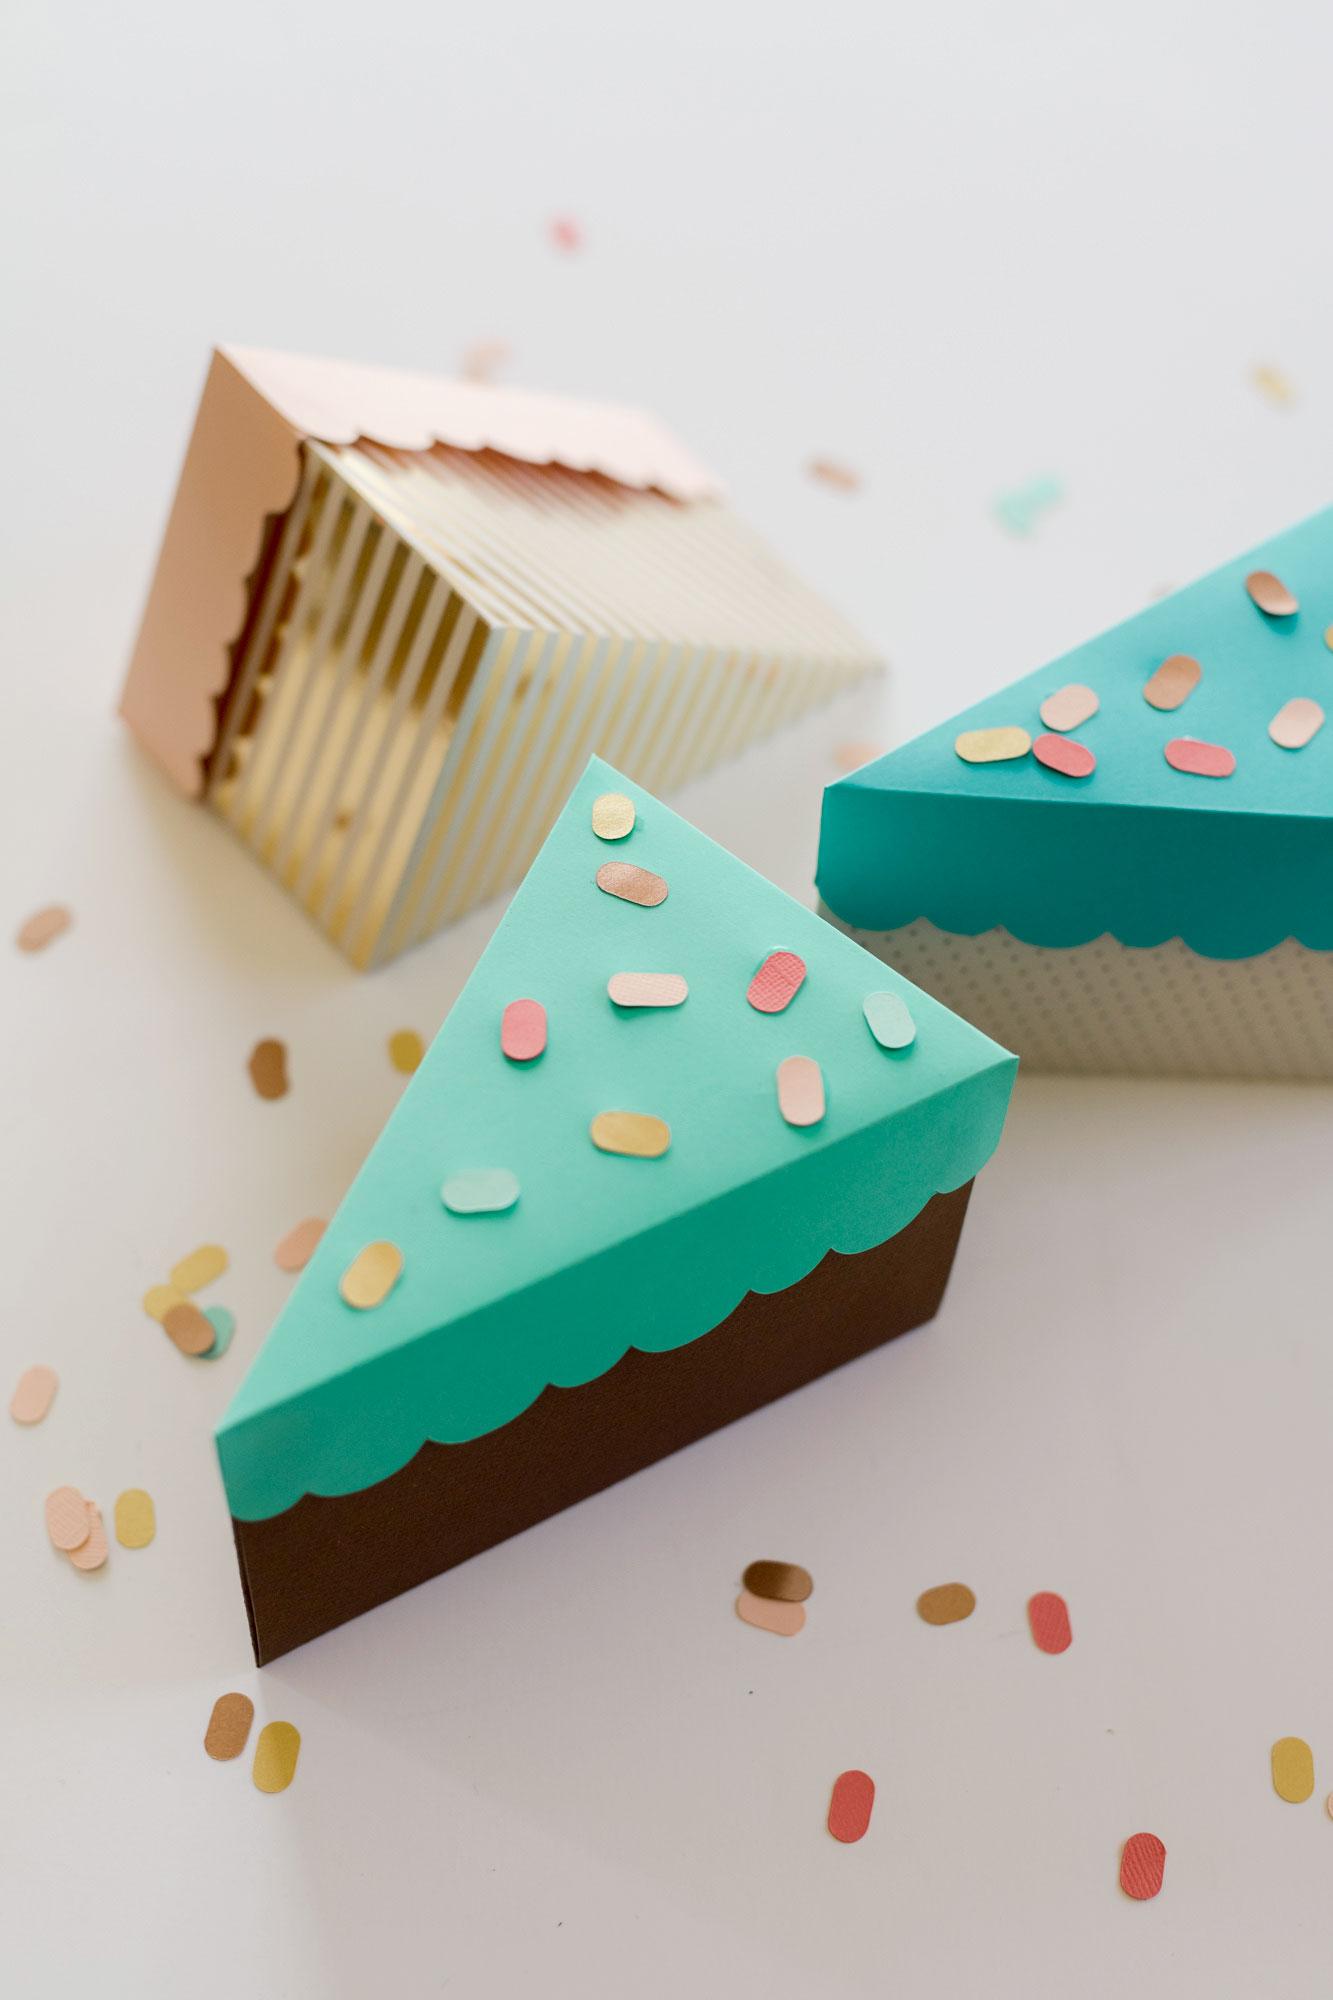 Birthday cake paper box, free SVG file, free cricut birthday party file, birthday party SVG free, Free birthday SVG file, free SVG file